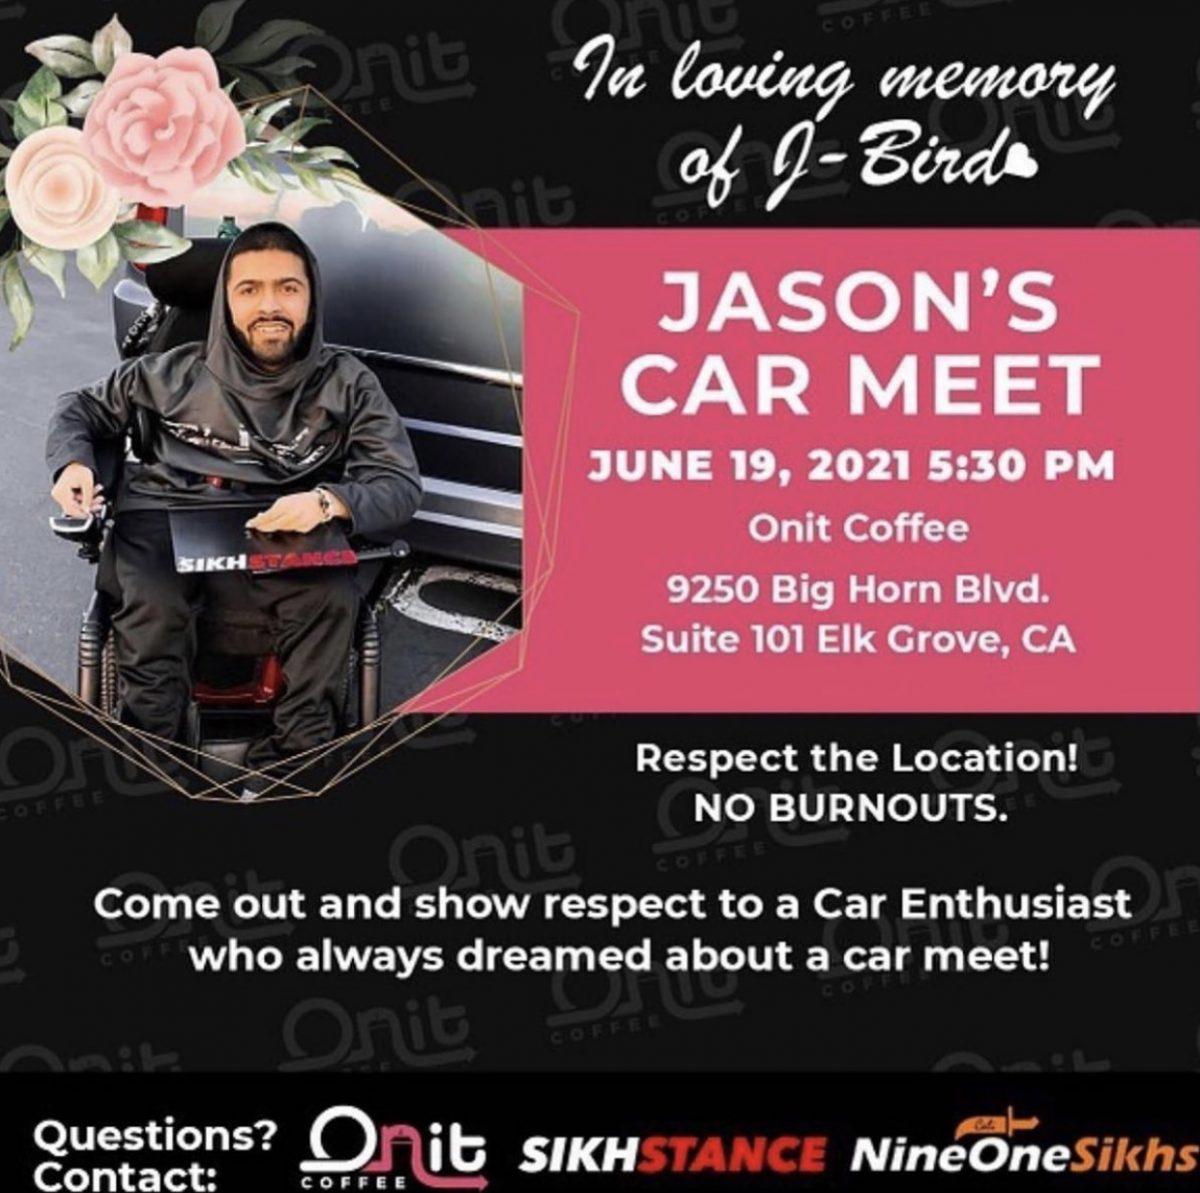 Jason's Car Meet